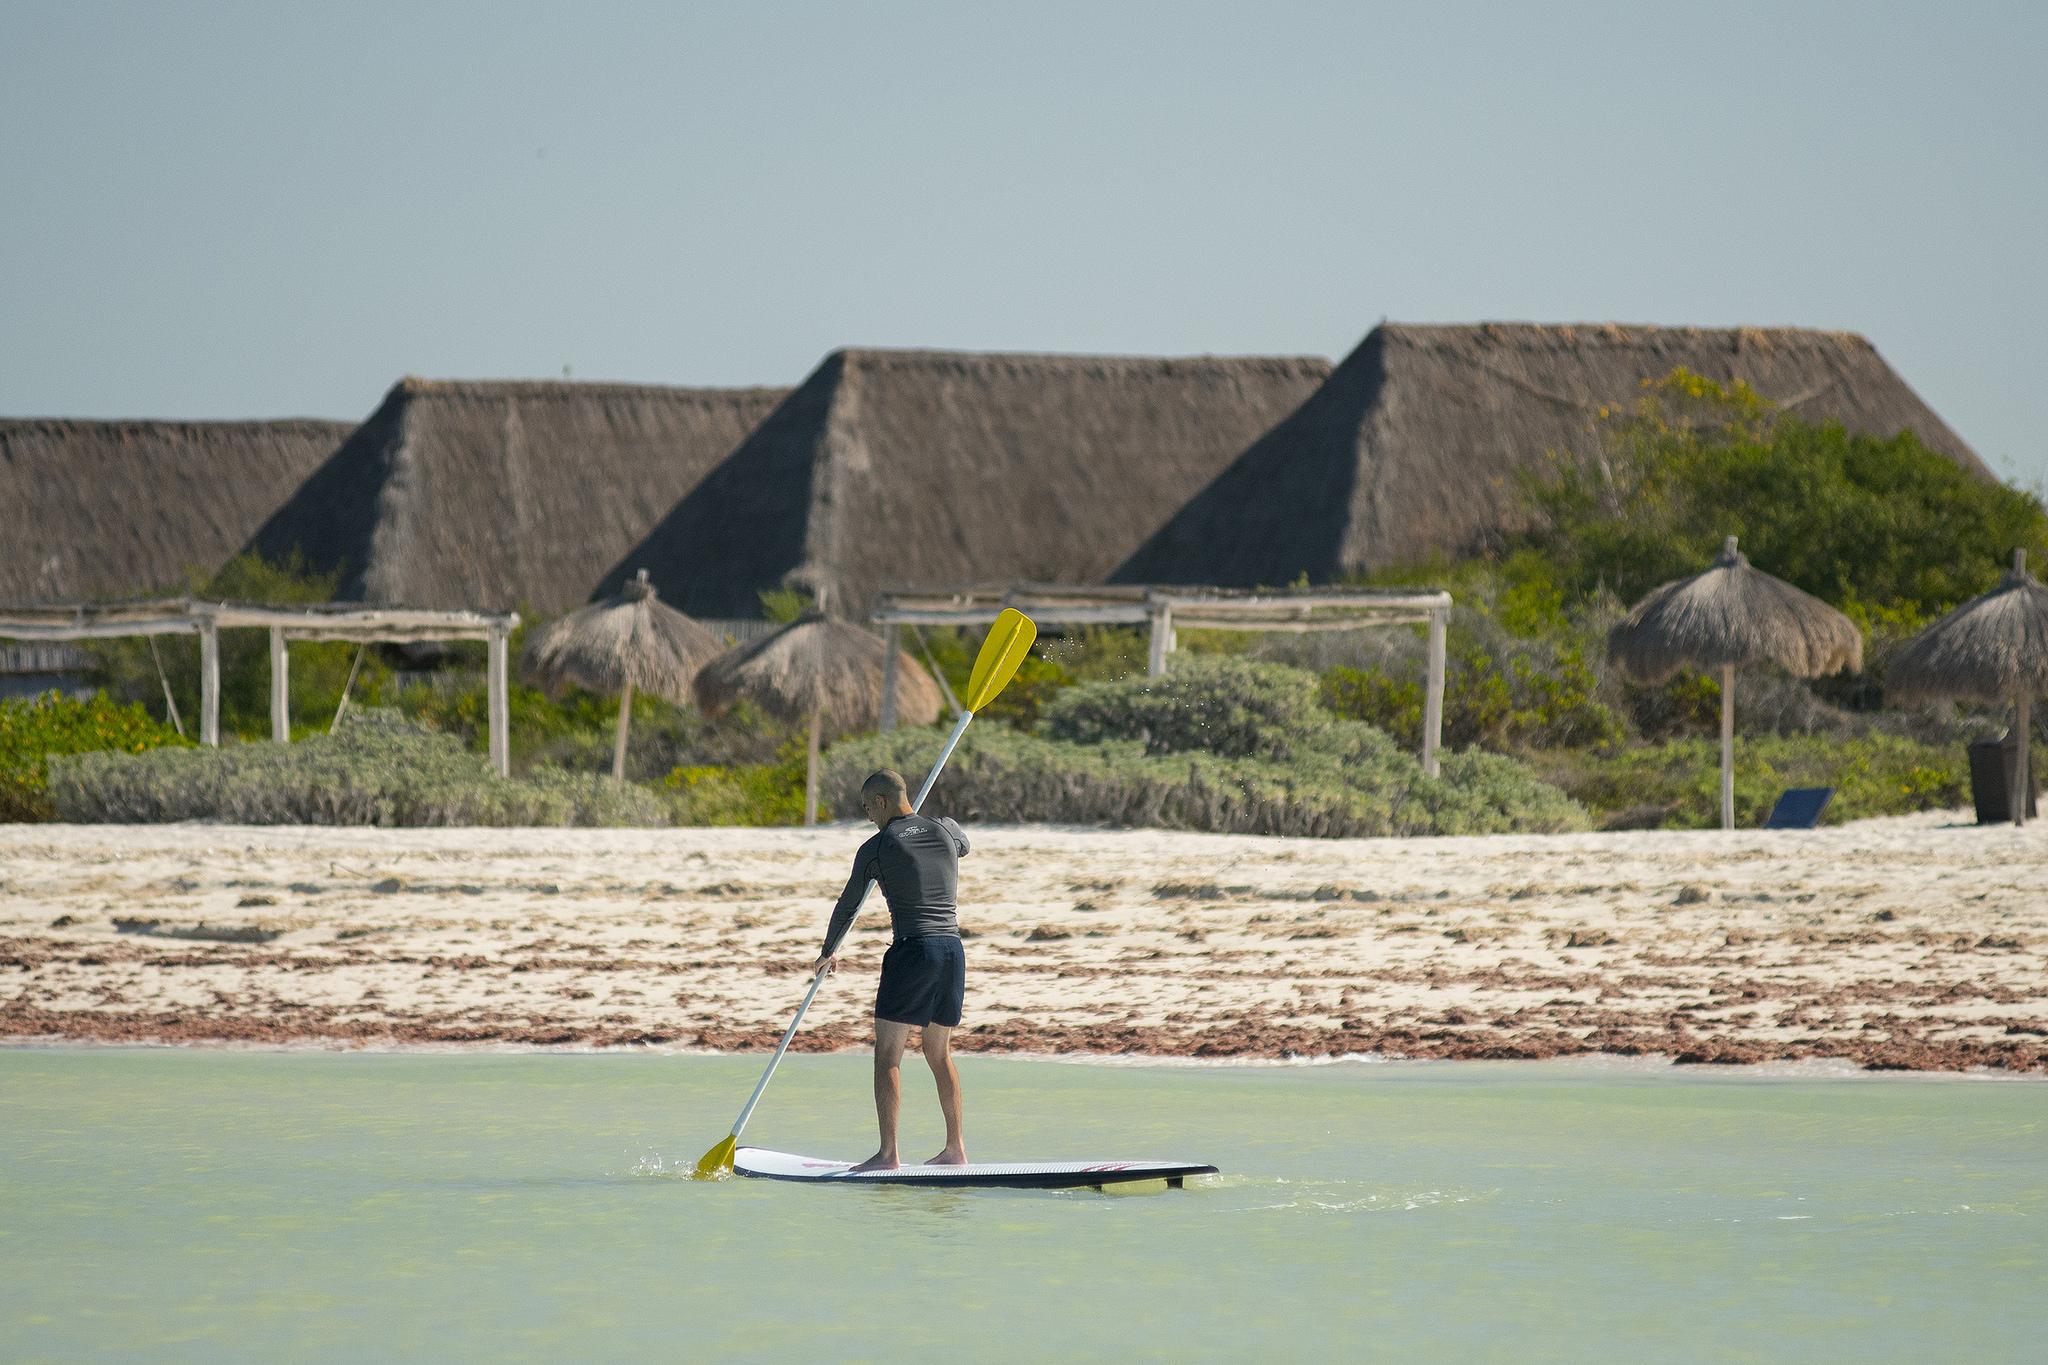 Dónde hospedarse en Celestún, Yucatán